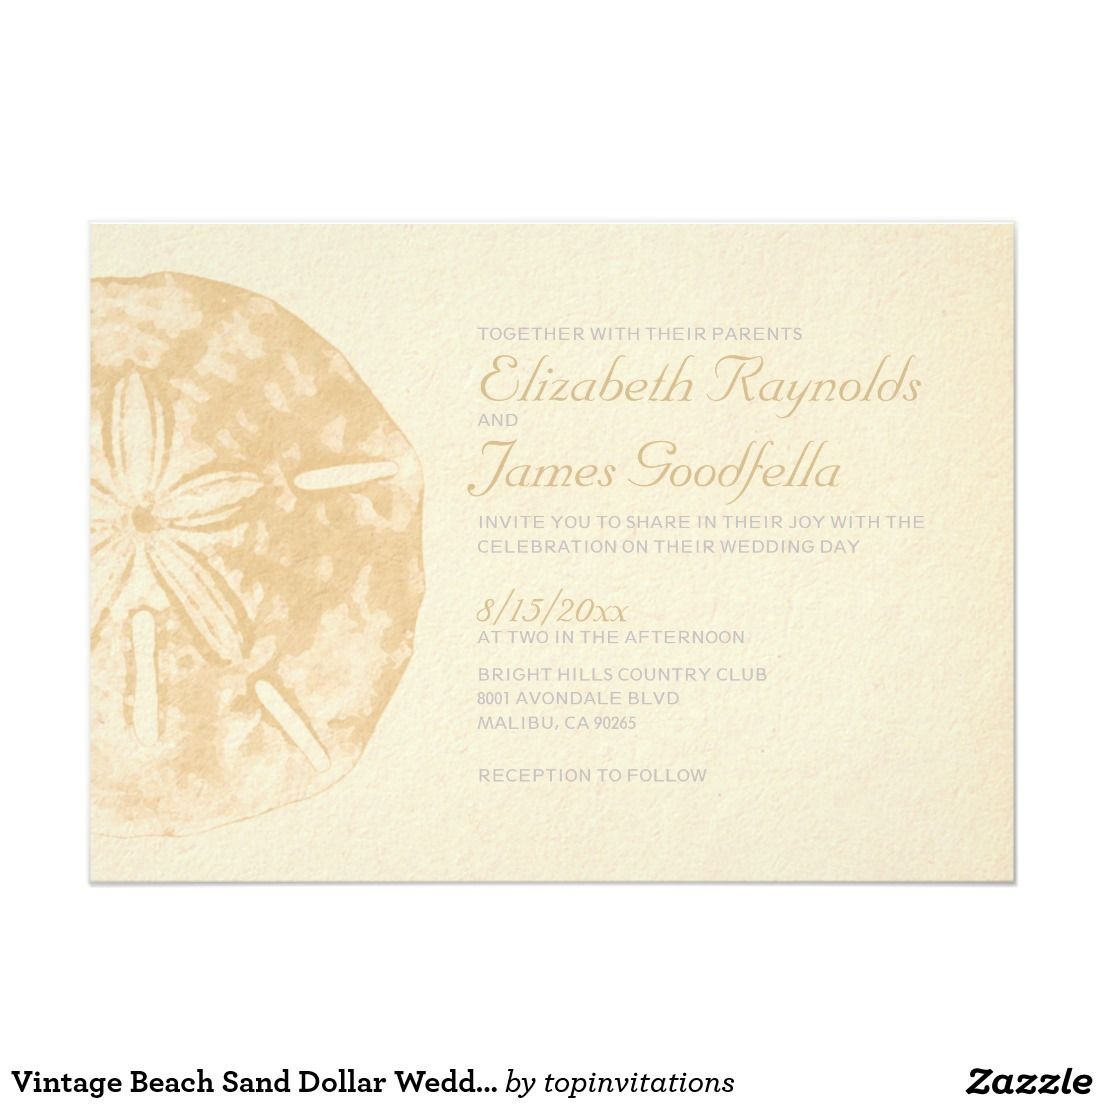 Vintage Beach Sand Dollar Wedding Invitations | NAUTICAL WEDDING ...